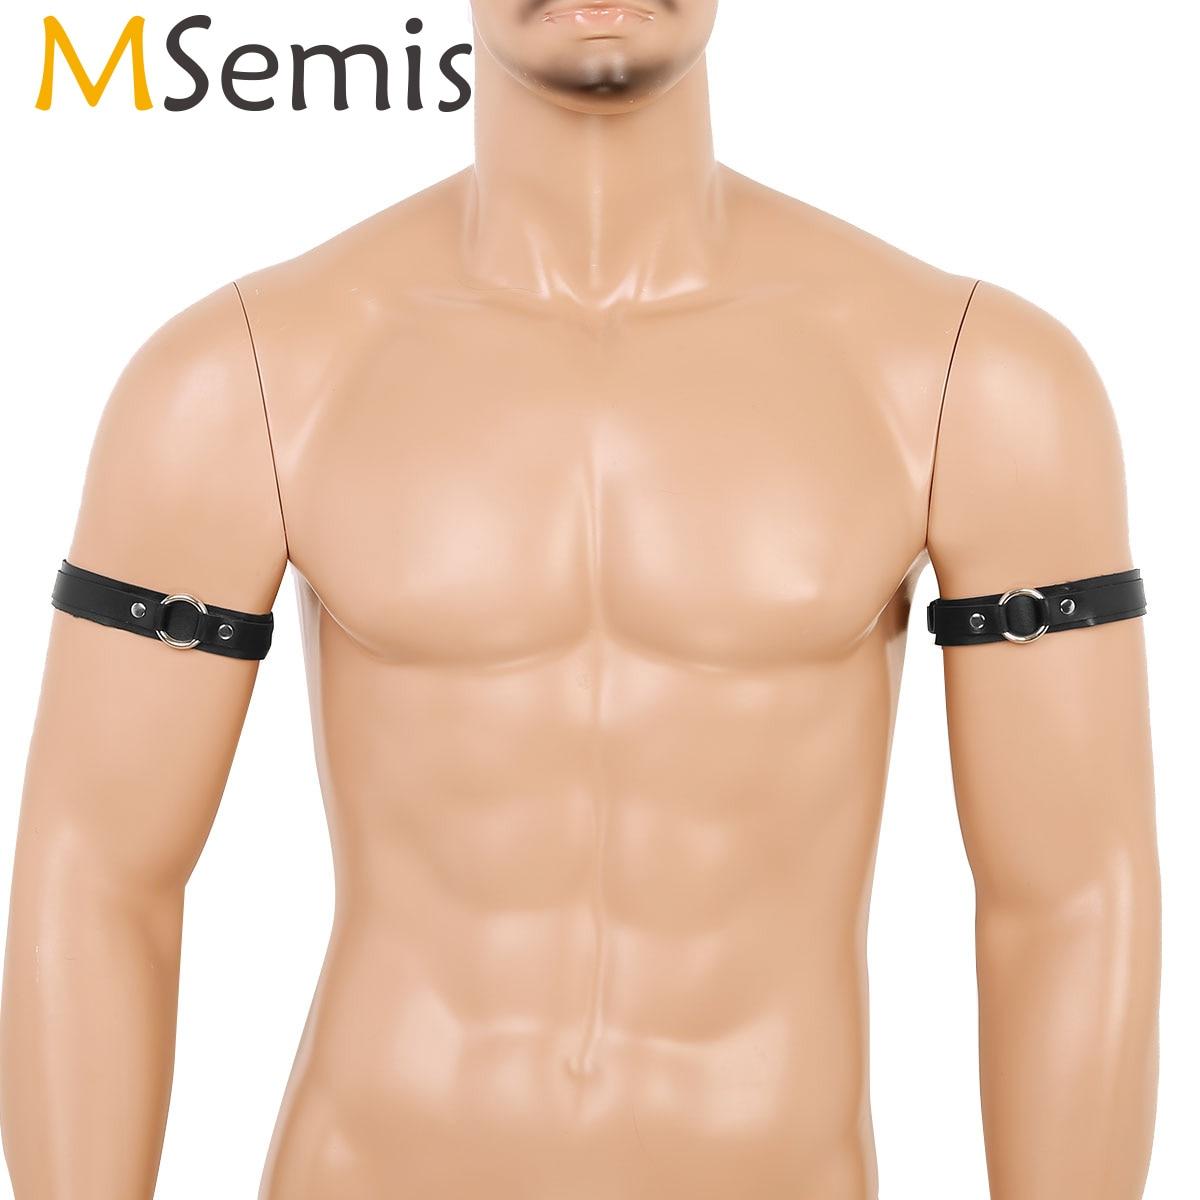 MSemis Arm Warmers Armbands Men Black PU Leather Vintage Punk Goth Armbands Adjustable Buckle Straps Clubwear Costume Accessory